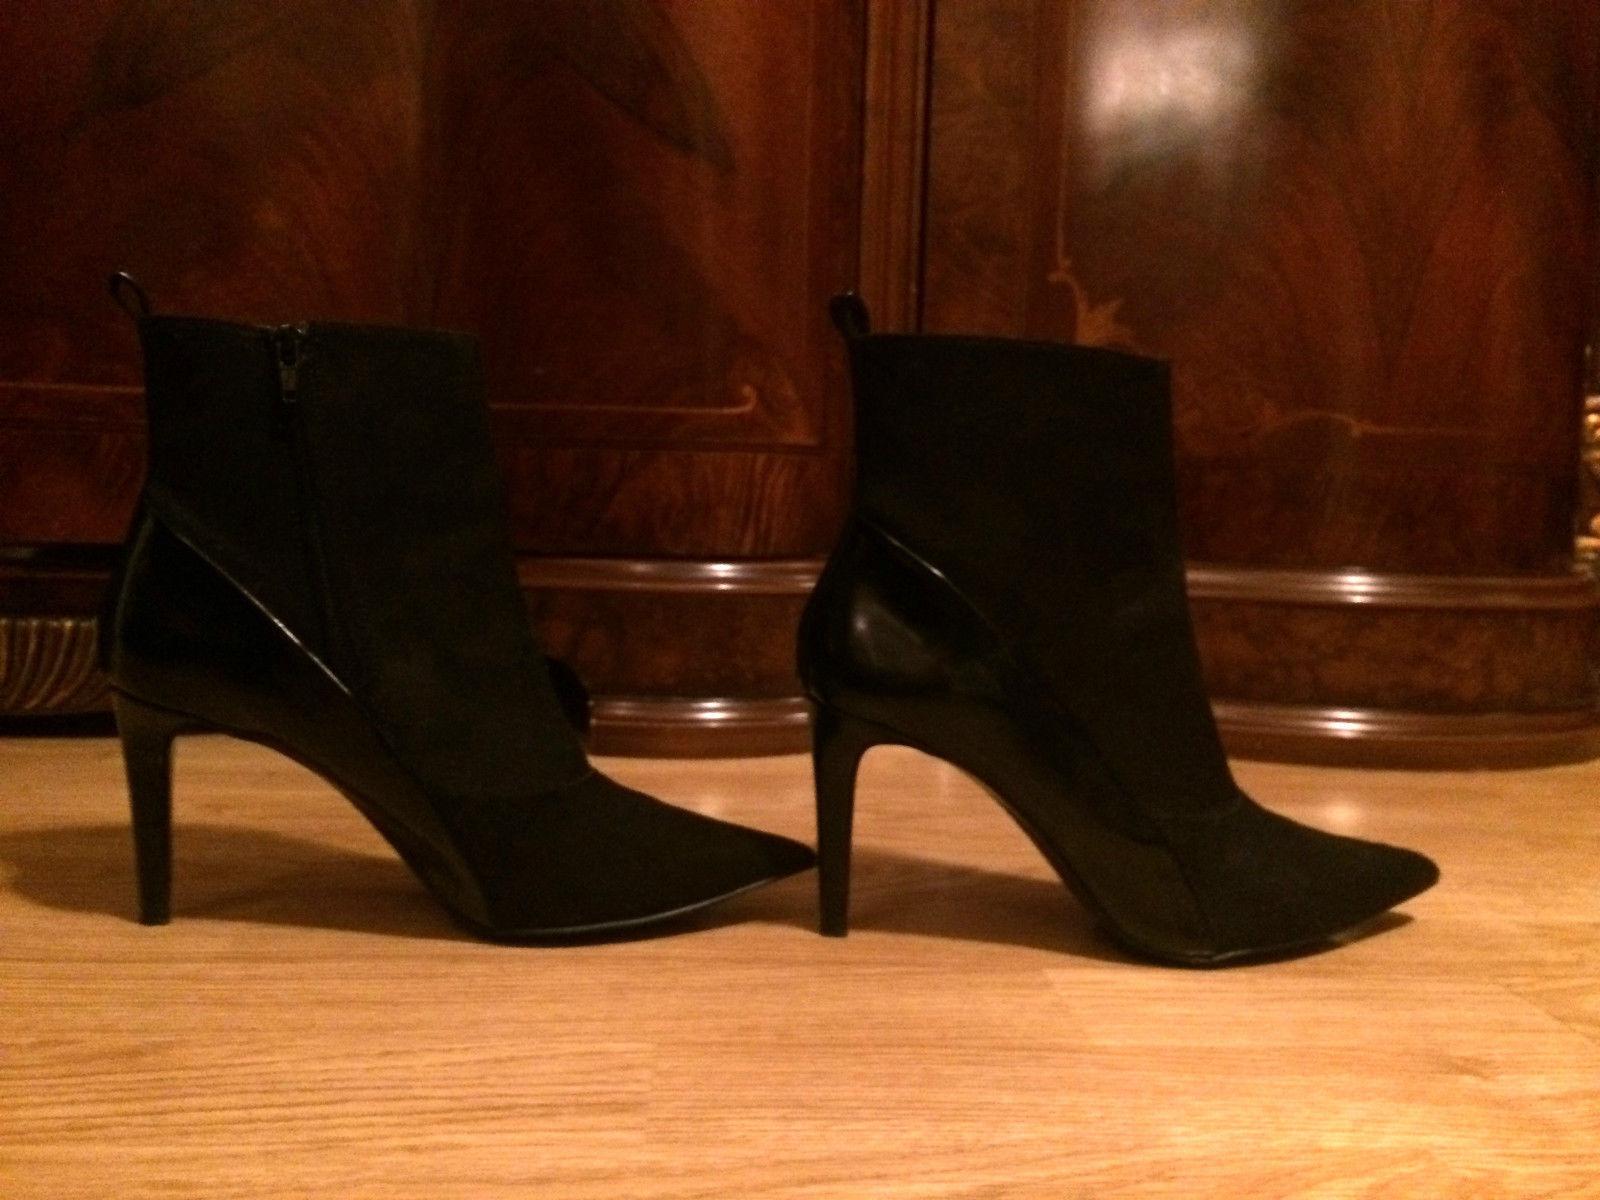 ZARA schwarz suede pointy toe suede Stiefel ankle slim medium heel Stiefel suede booties 39 9 0be36c